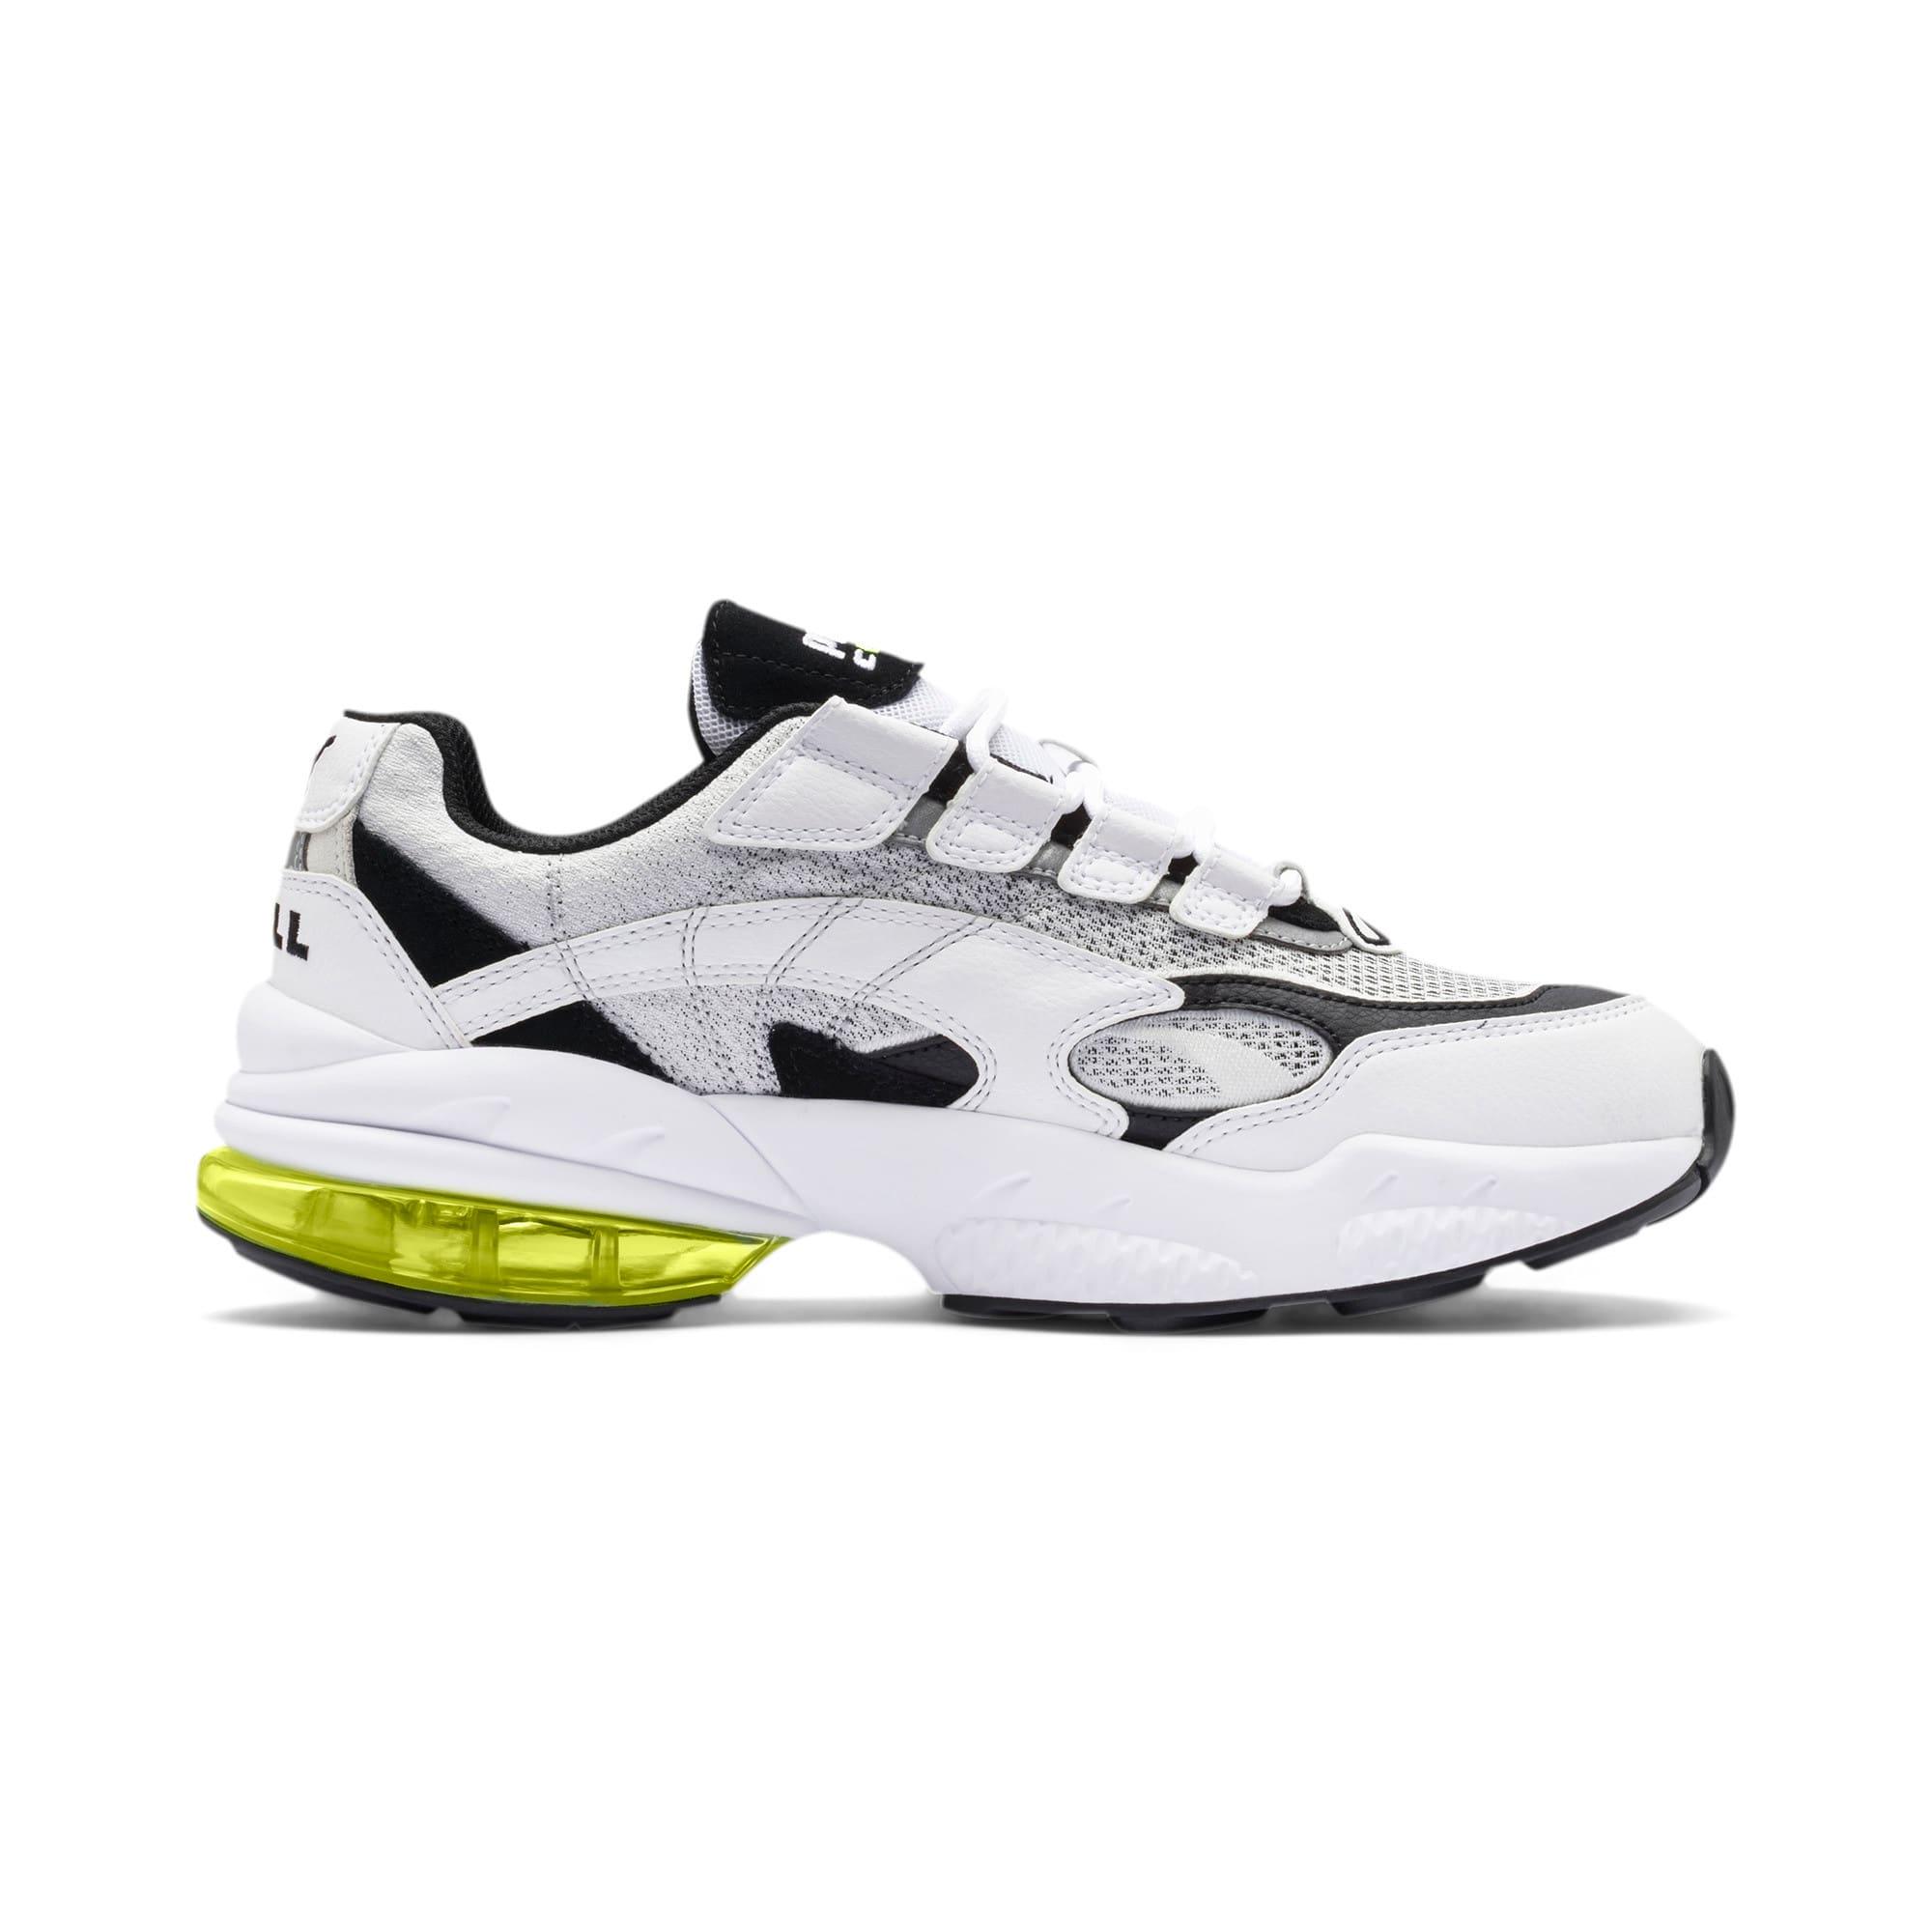 Thumbnail 6 of CELL Venom Alert Sneakers, Puma White-Puma Black, medium